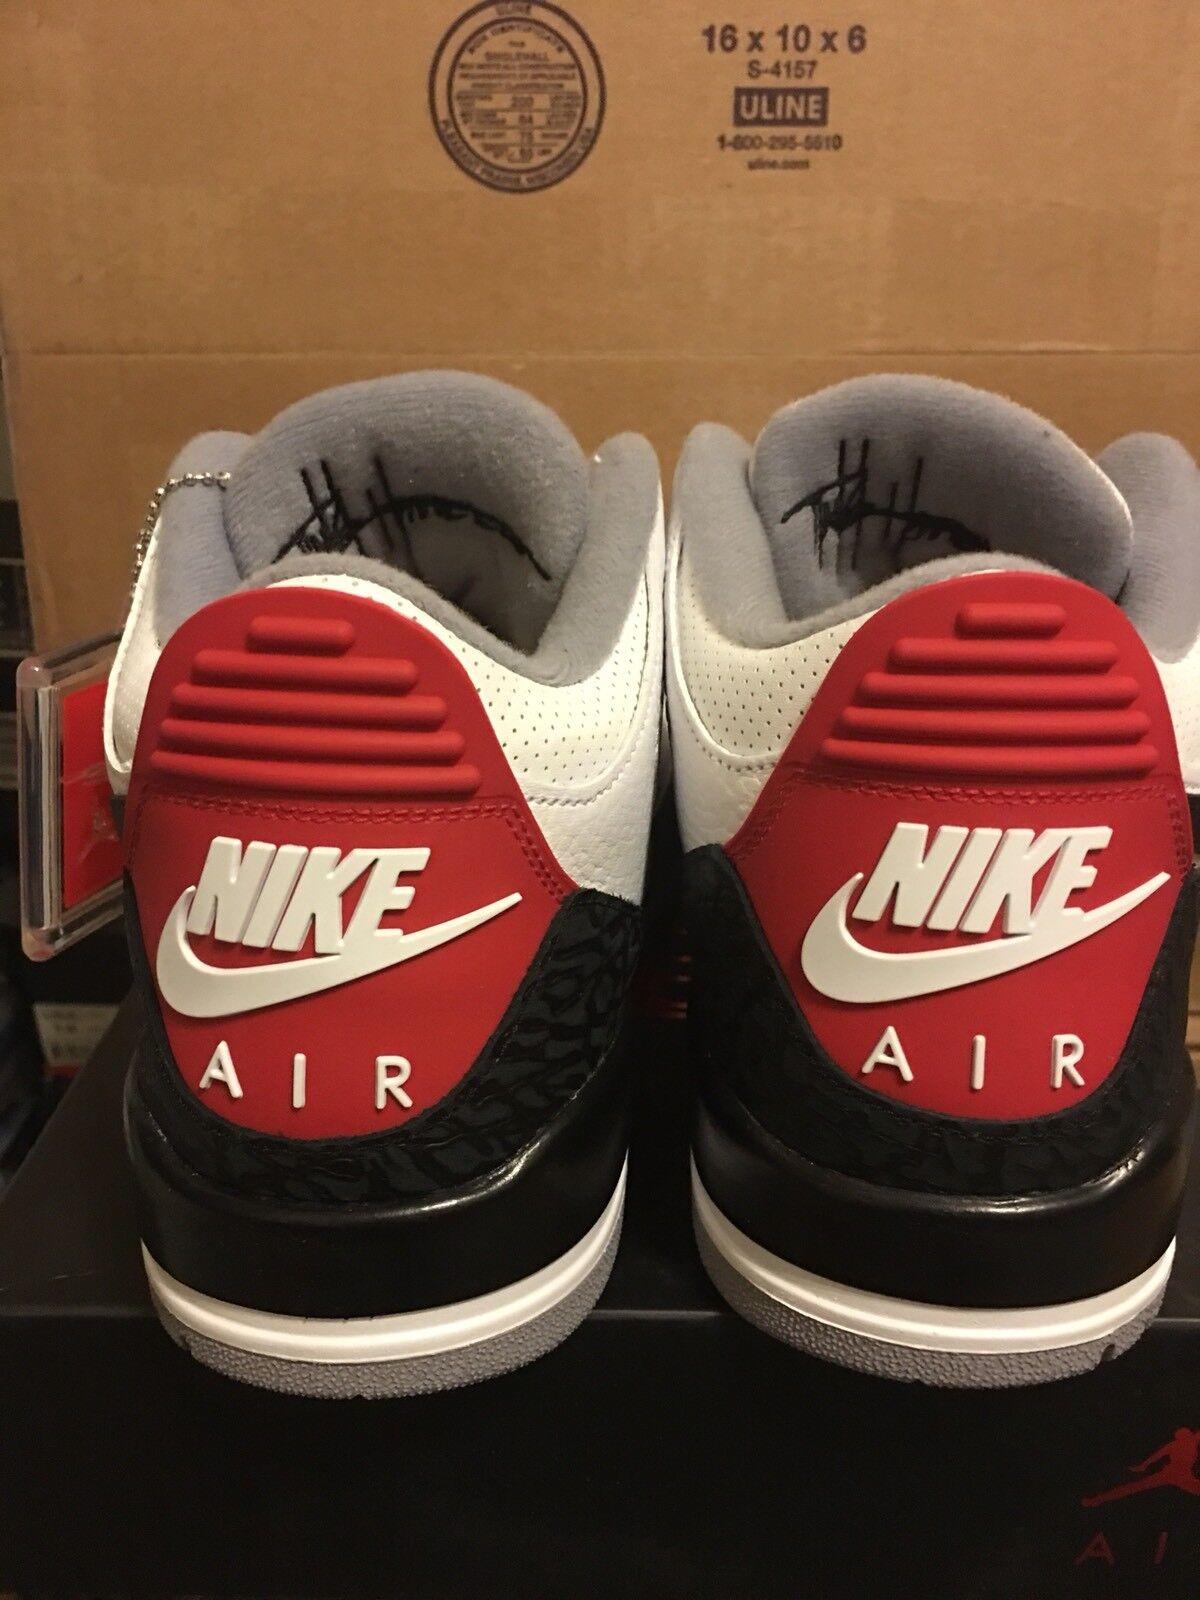 Nike Air Jordan 3 Retro Tinker NRG 719864-010 AQ3835-160 Size 9